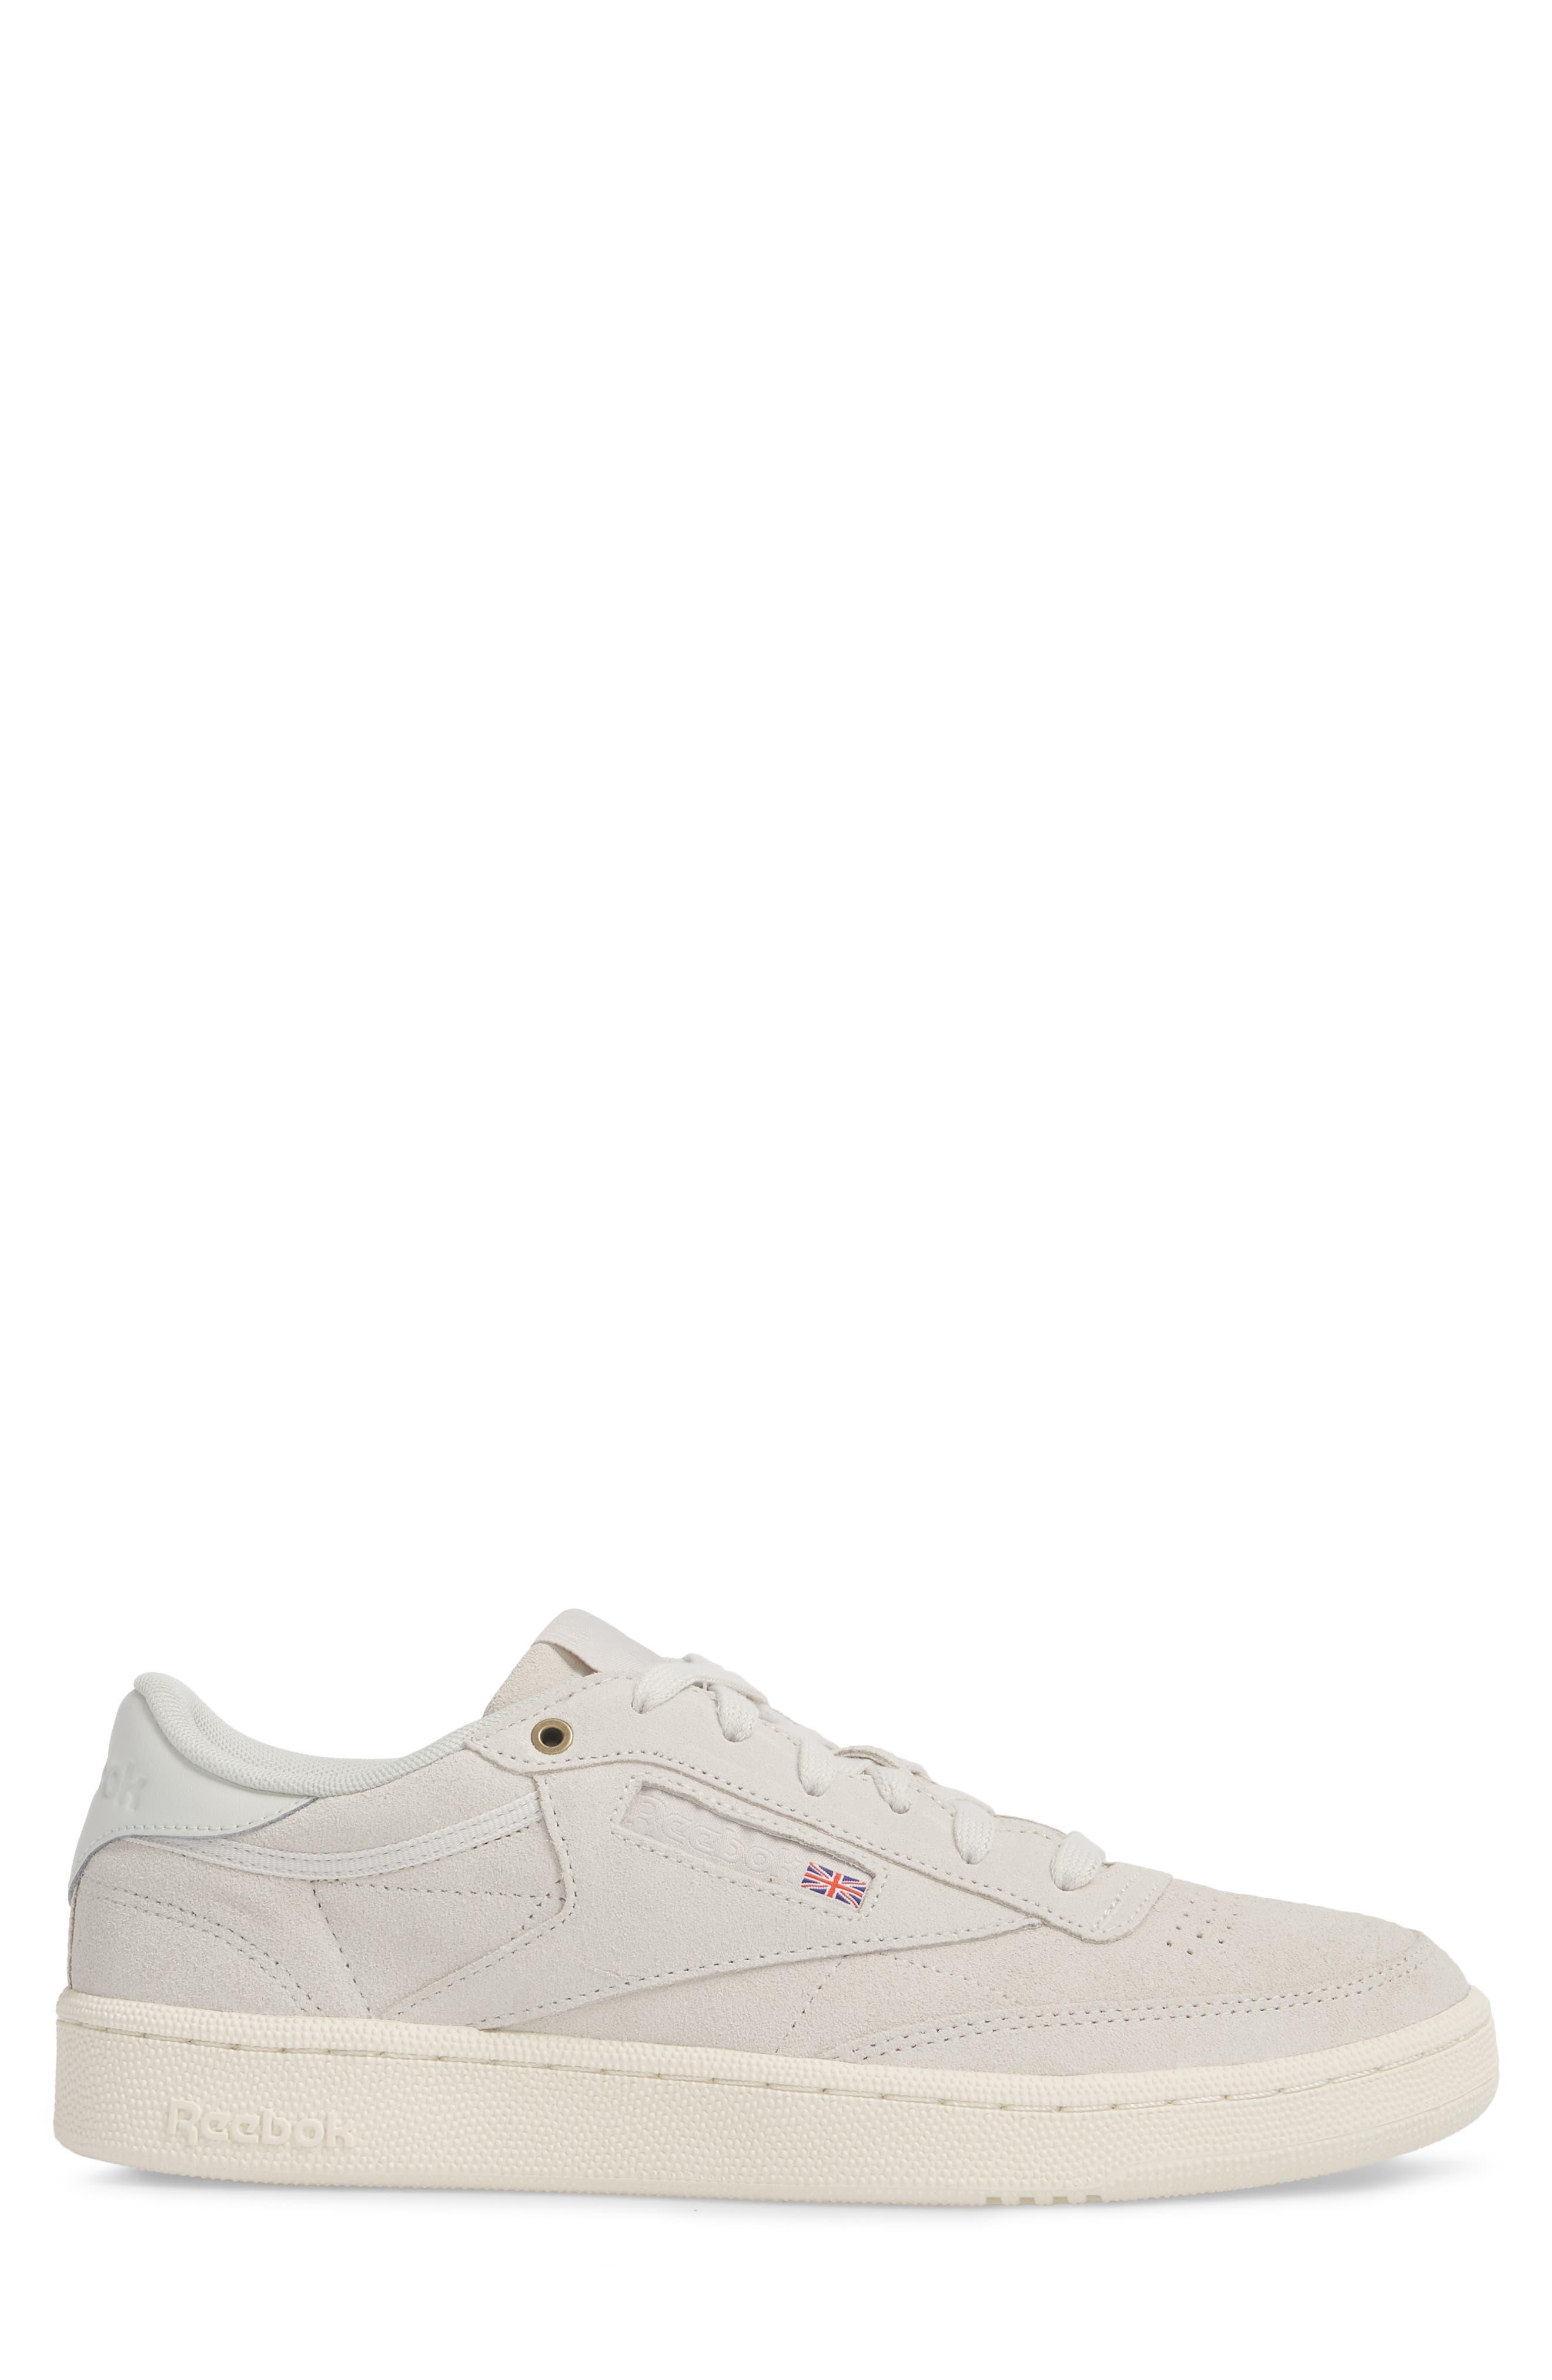 Club C 85 MCC Sneaker,                             Alternate thumbnail 3, color,                             020